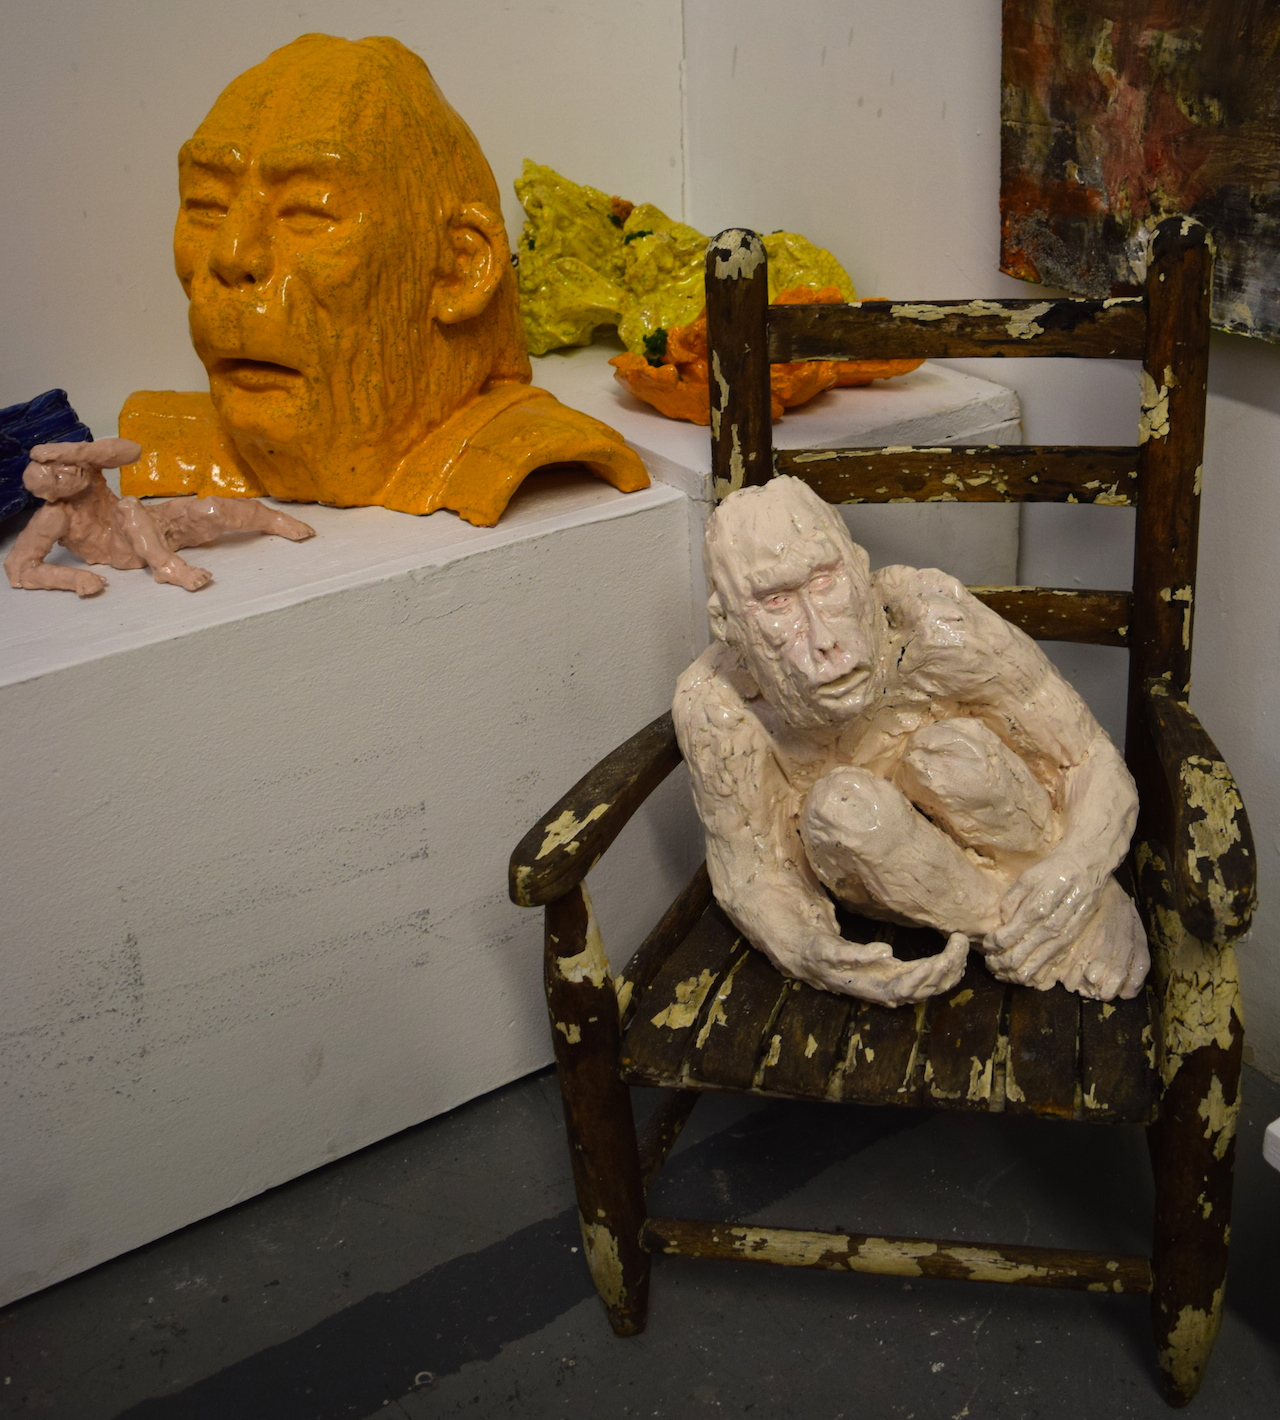 Ceramic sculptures by Dasha Bazanova in studio 216 at 1717 Troutman